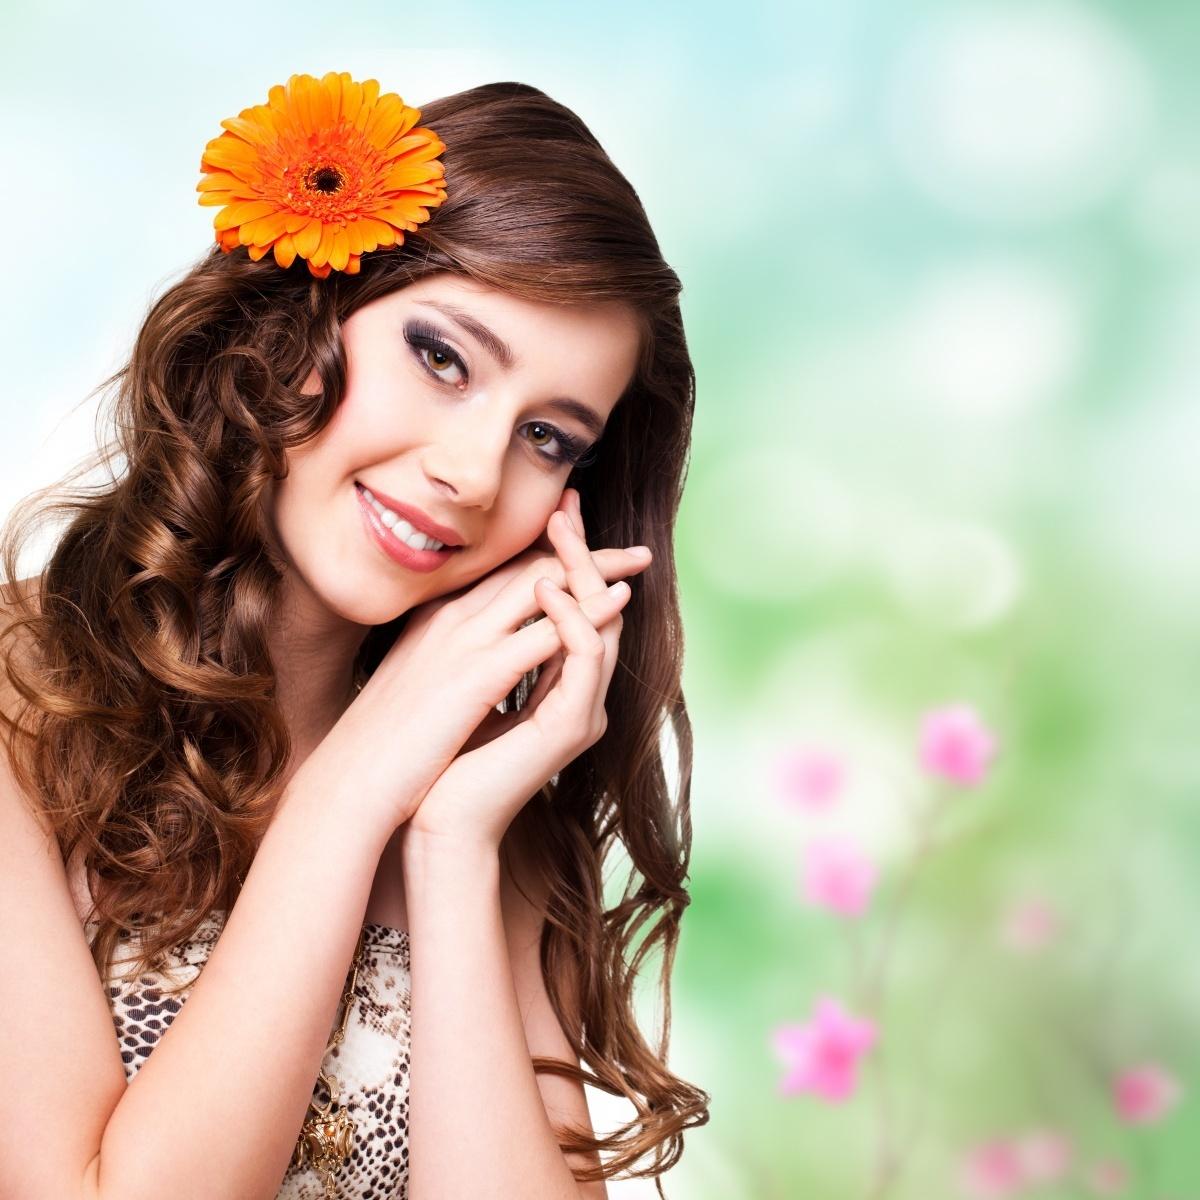 Девушка с цветком фото